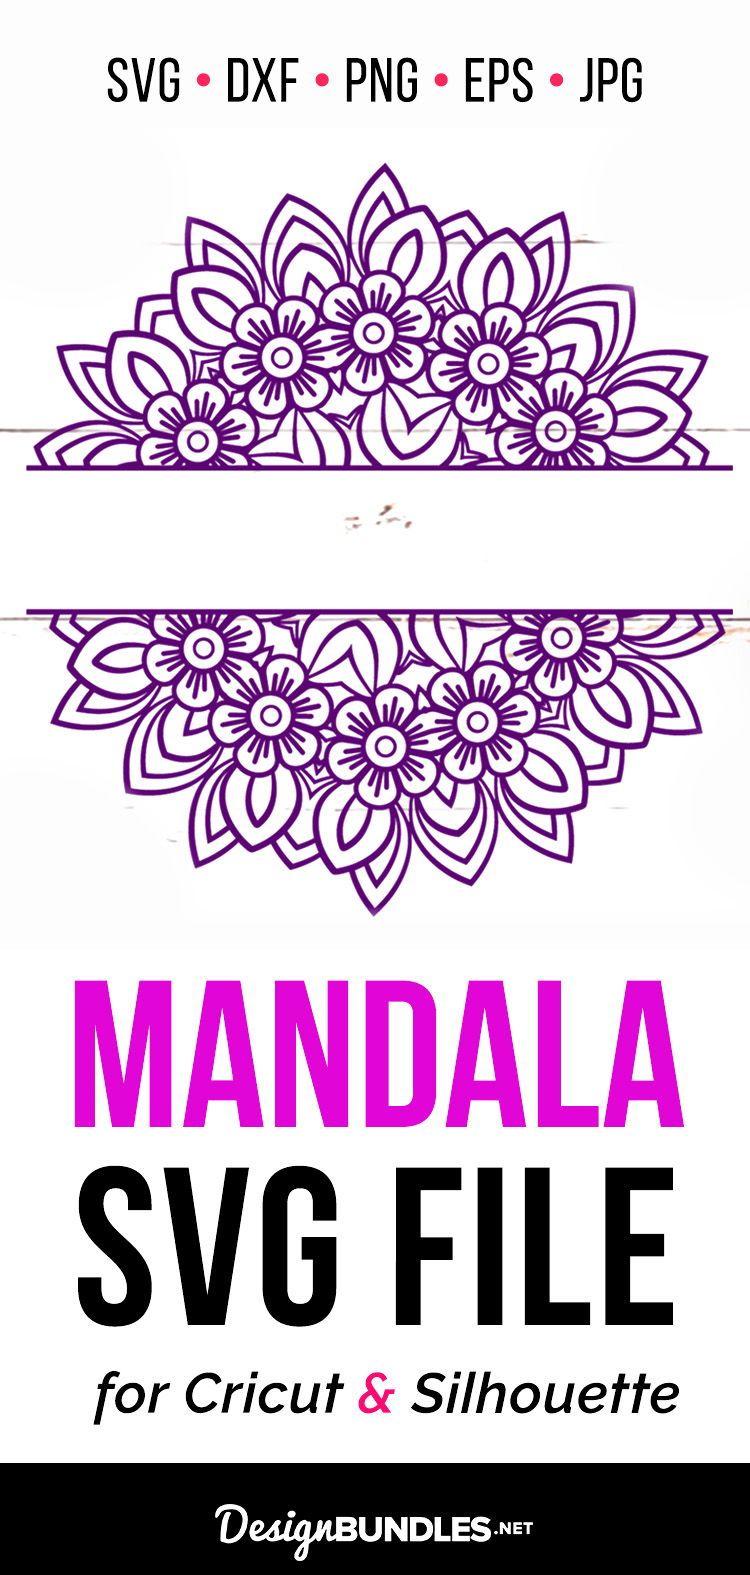 Mandala SVG Cut File for Silhouette Cricut